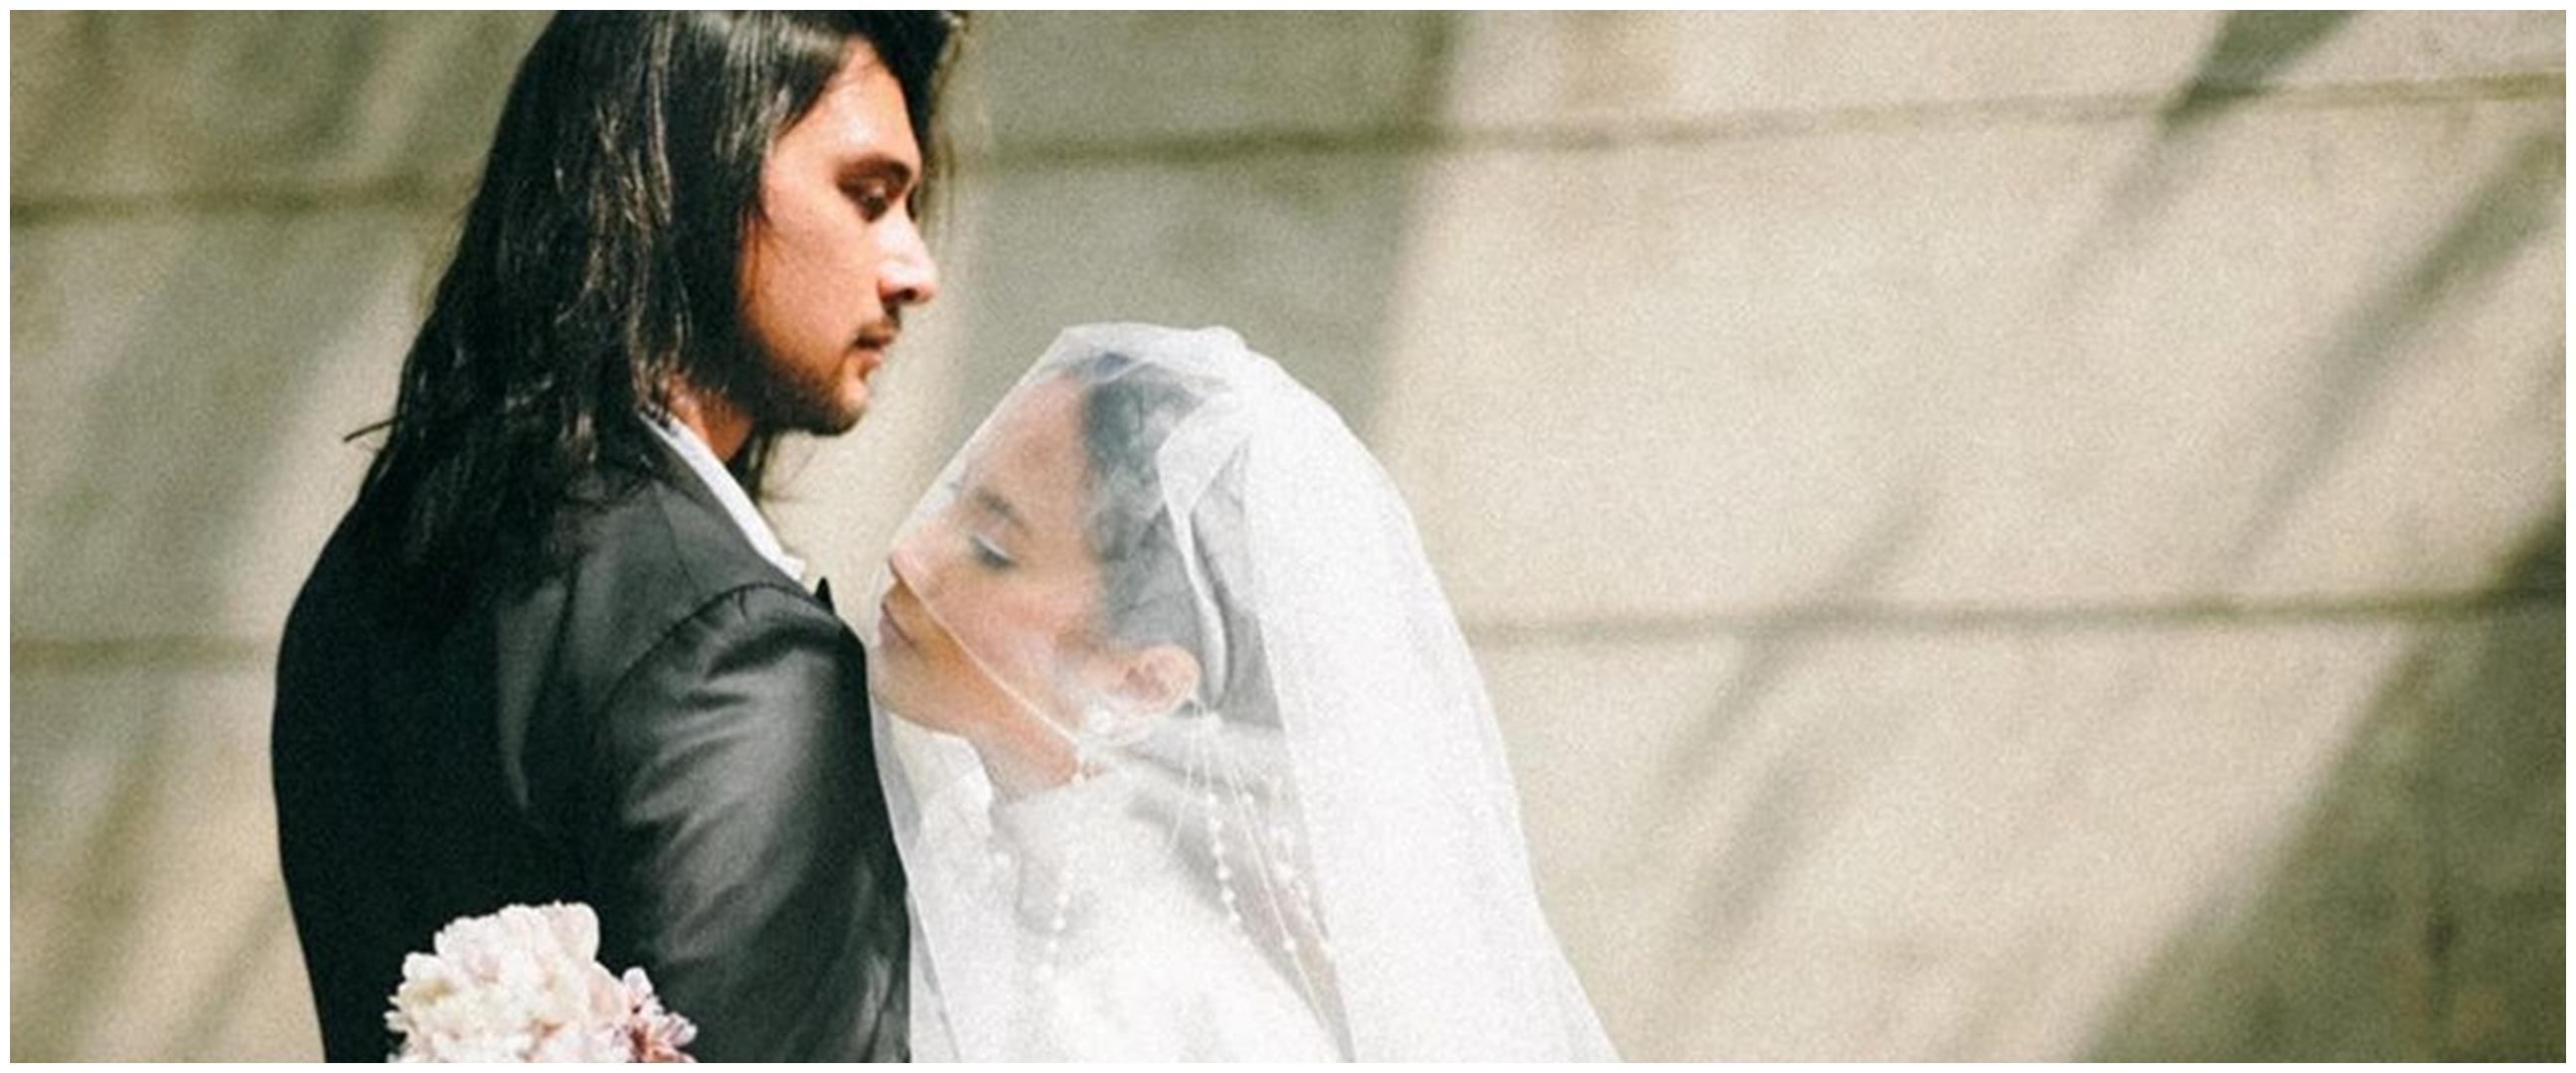 Unggahan Daniel Adnan di hari pernikahannya ini bikin hati luluh